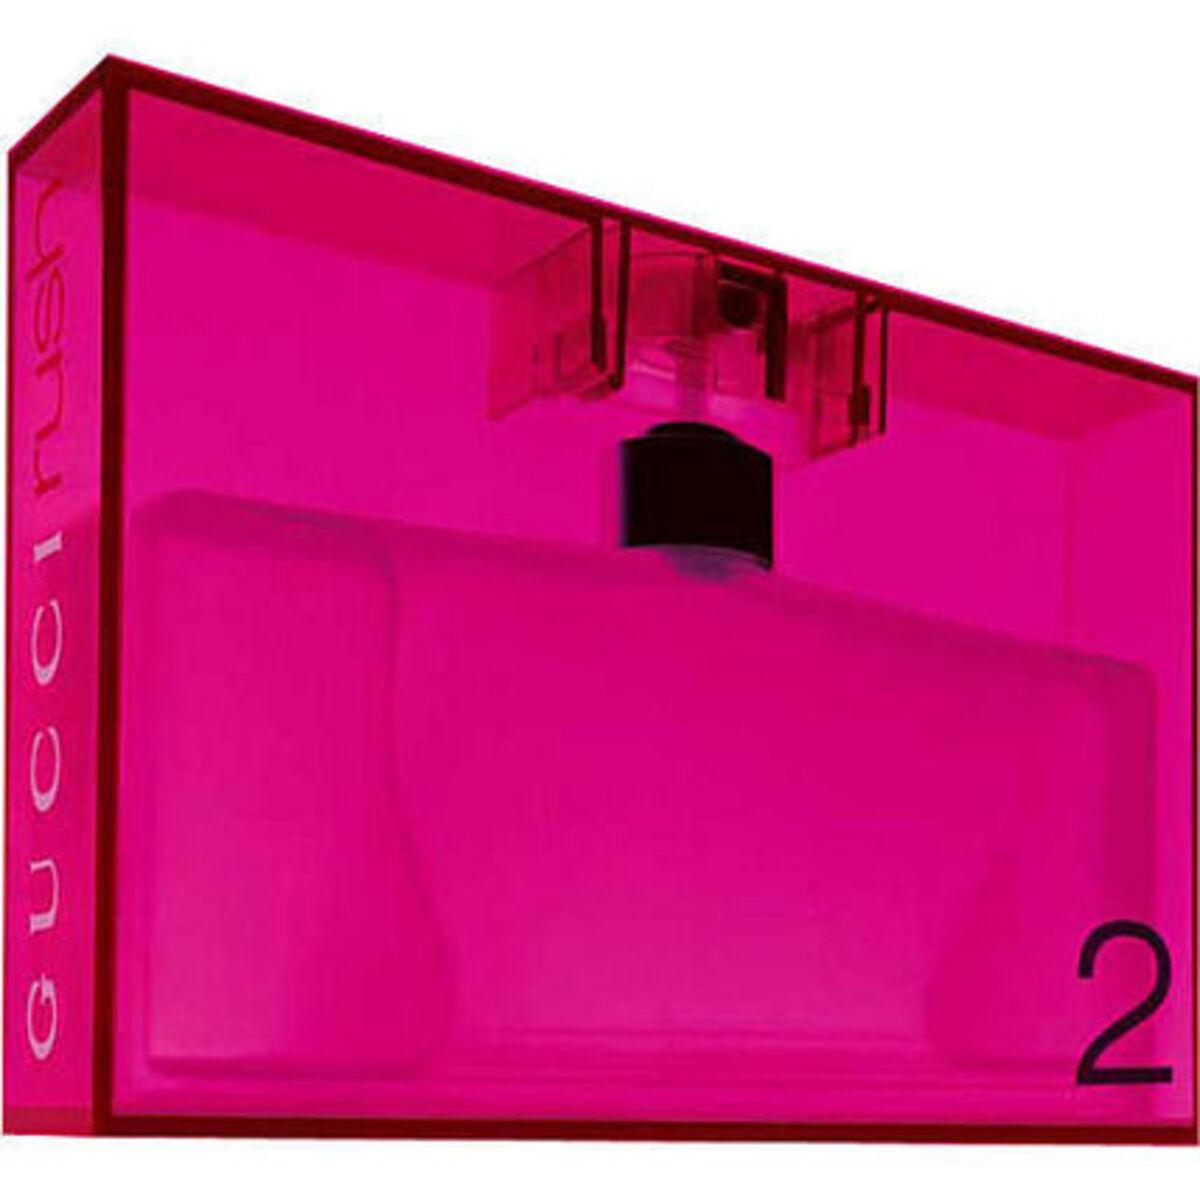 Bild 1 von Gucci Rush 2, Eau de Toilette, 50 ml